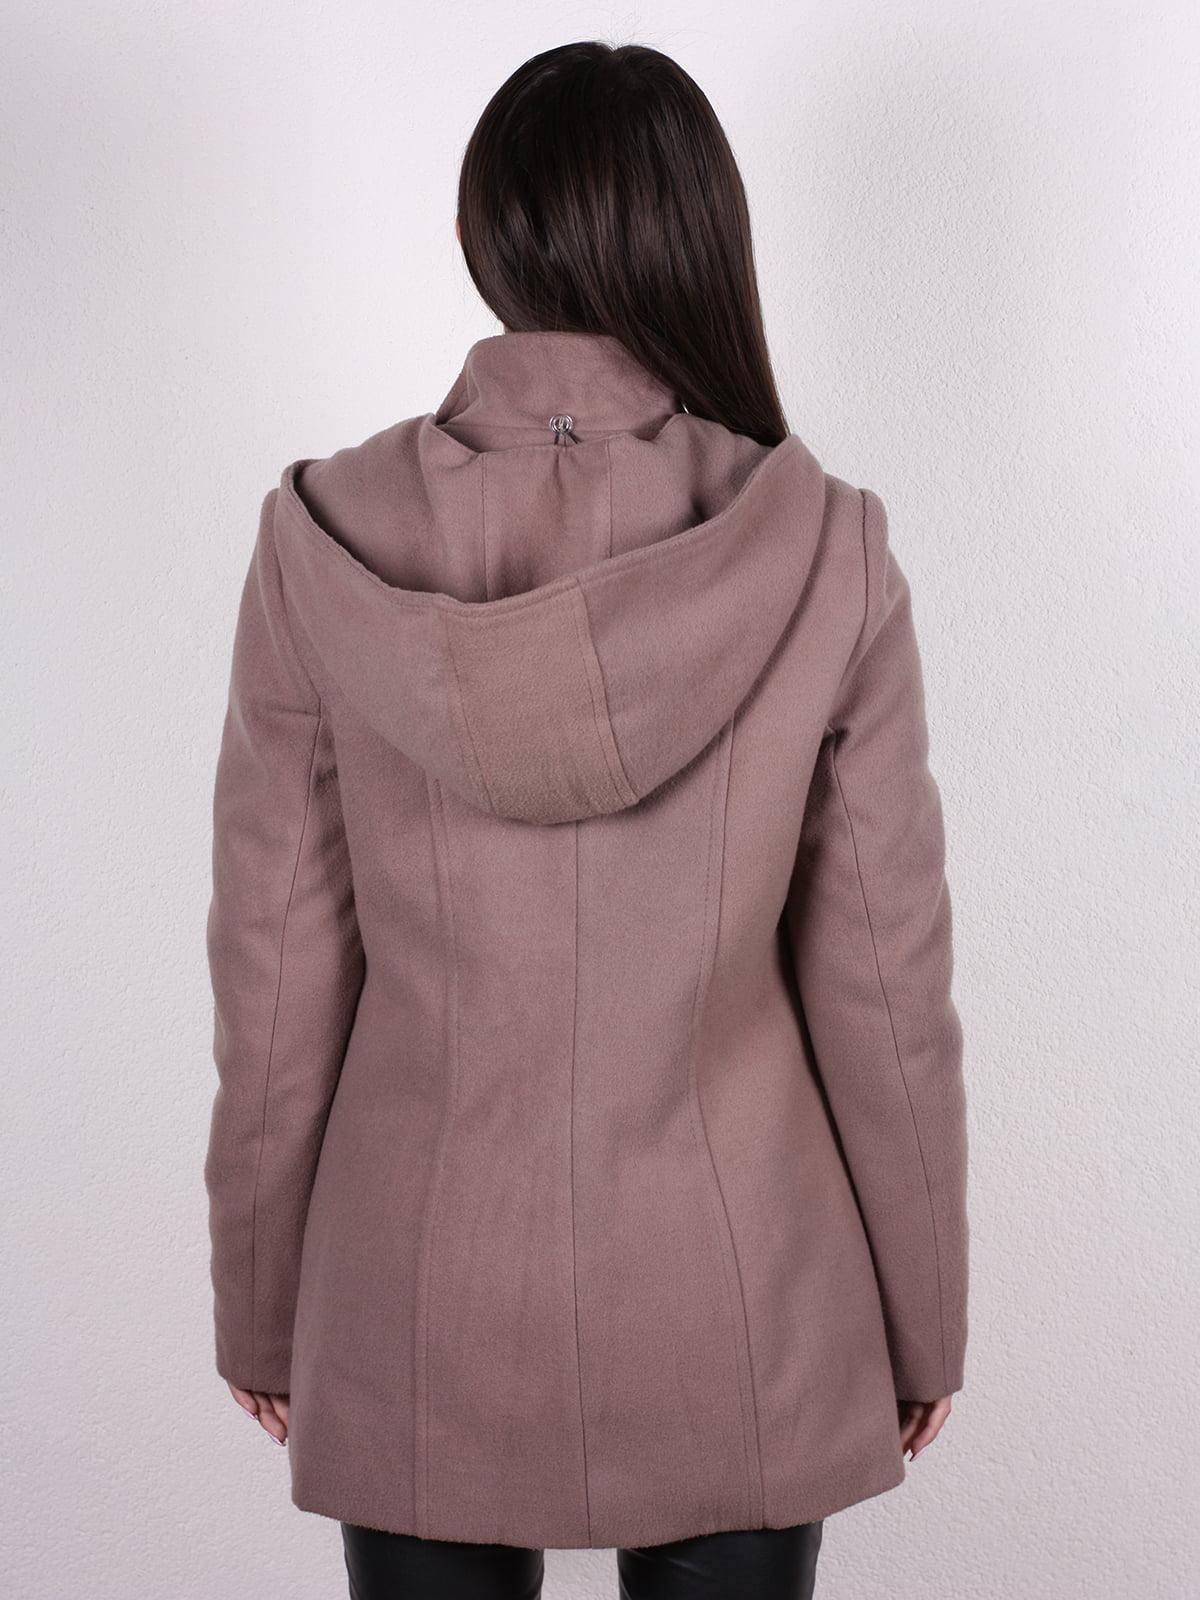 Пальто кофейно-пудрового цвета | 4922424 | фото 3